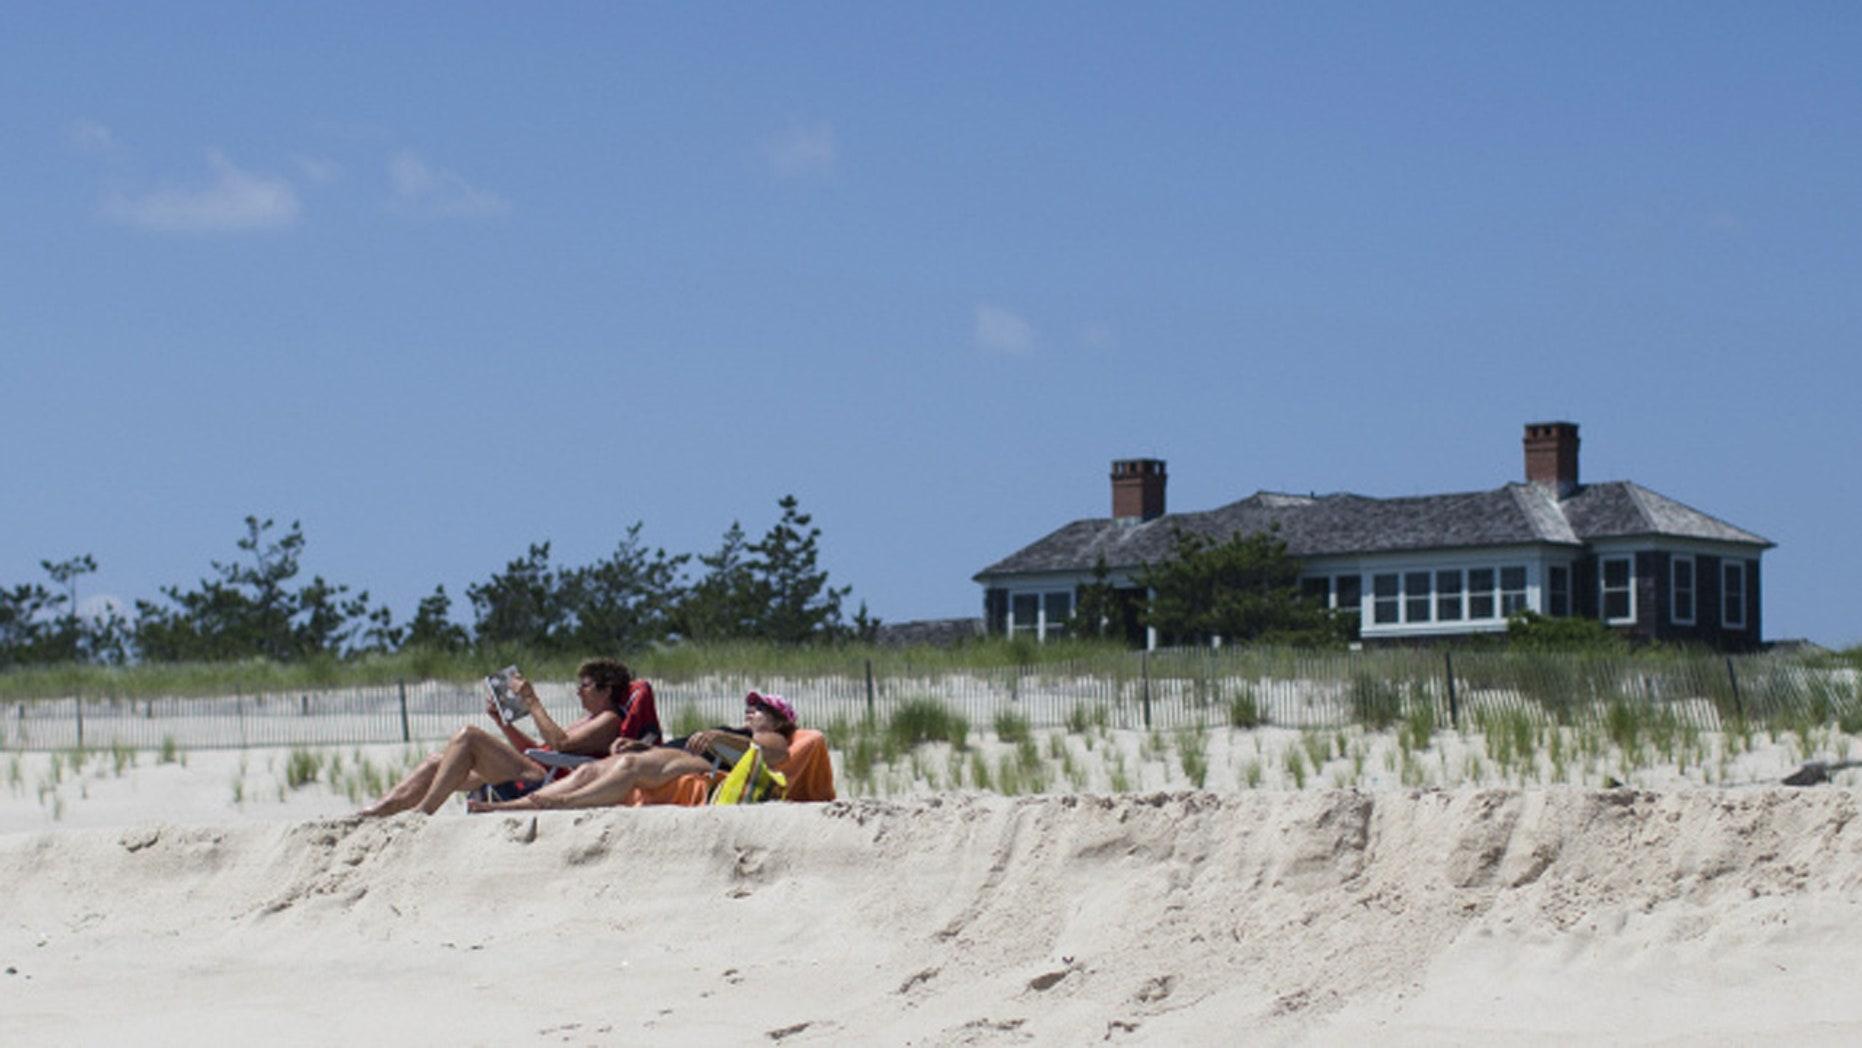 Beachgoers relax near a beachfront property in Southampton, N.Y.